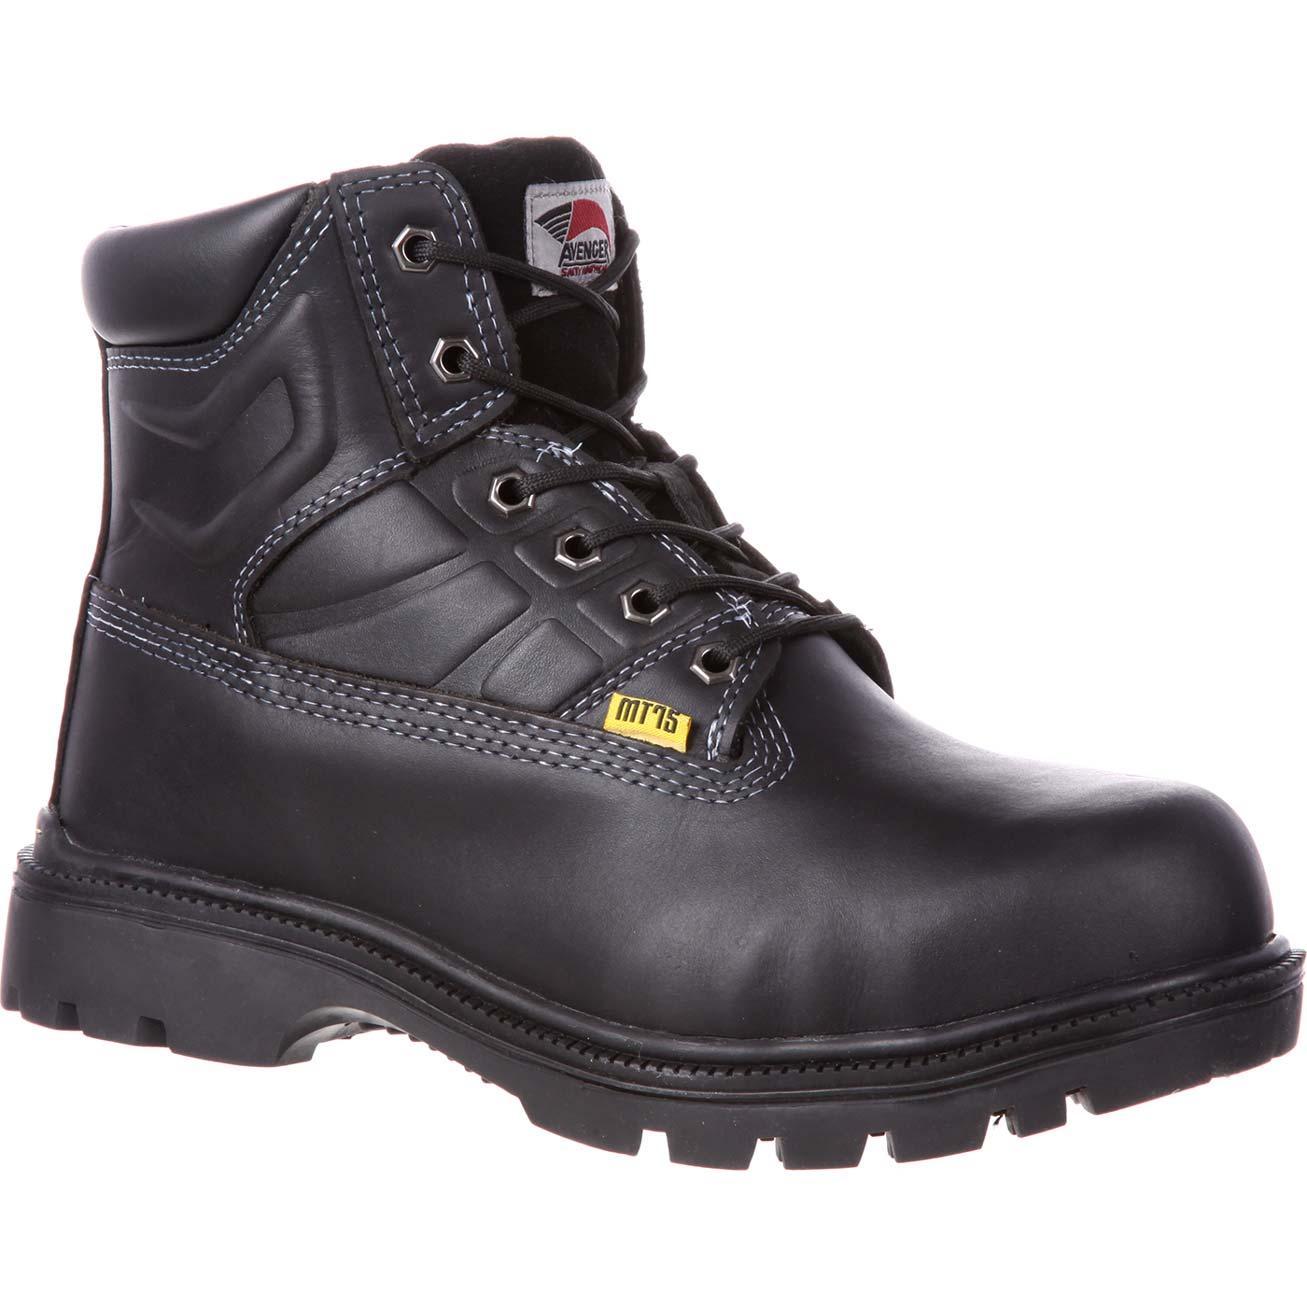 fdba5143273 Avenger Steel Toe Internal Met Guard Work Boot